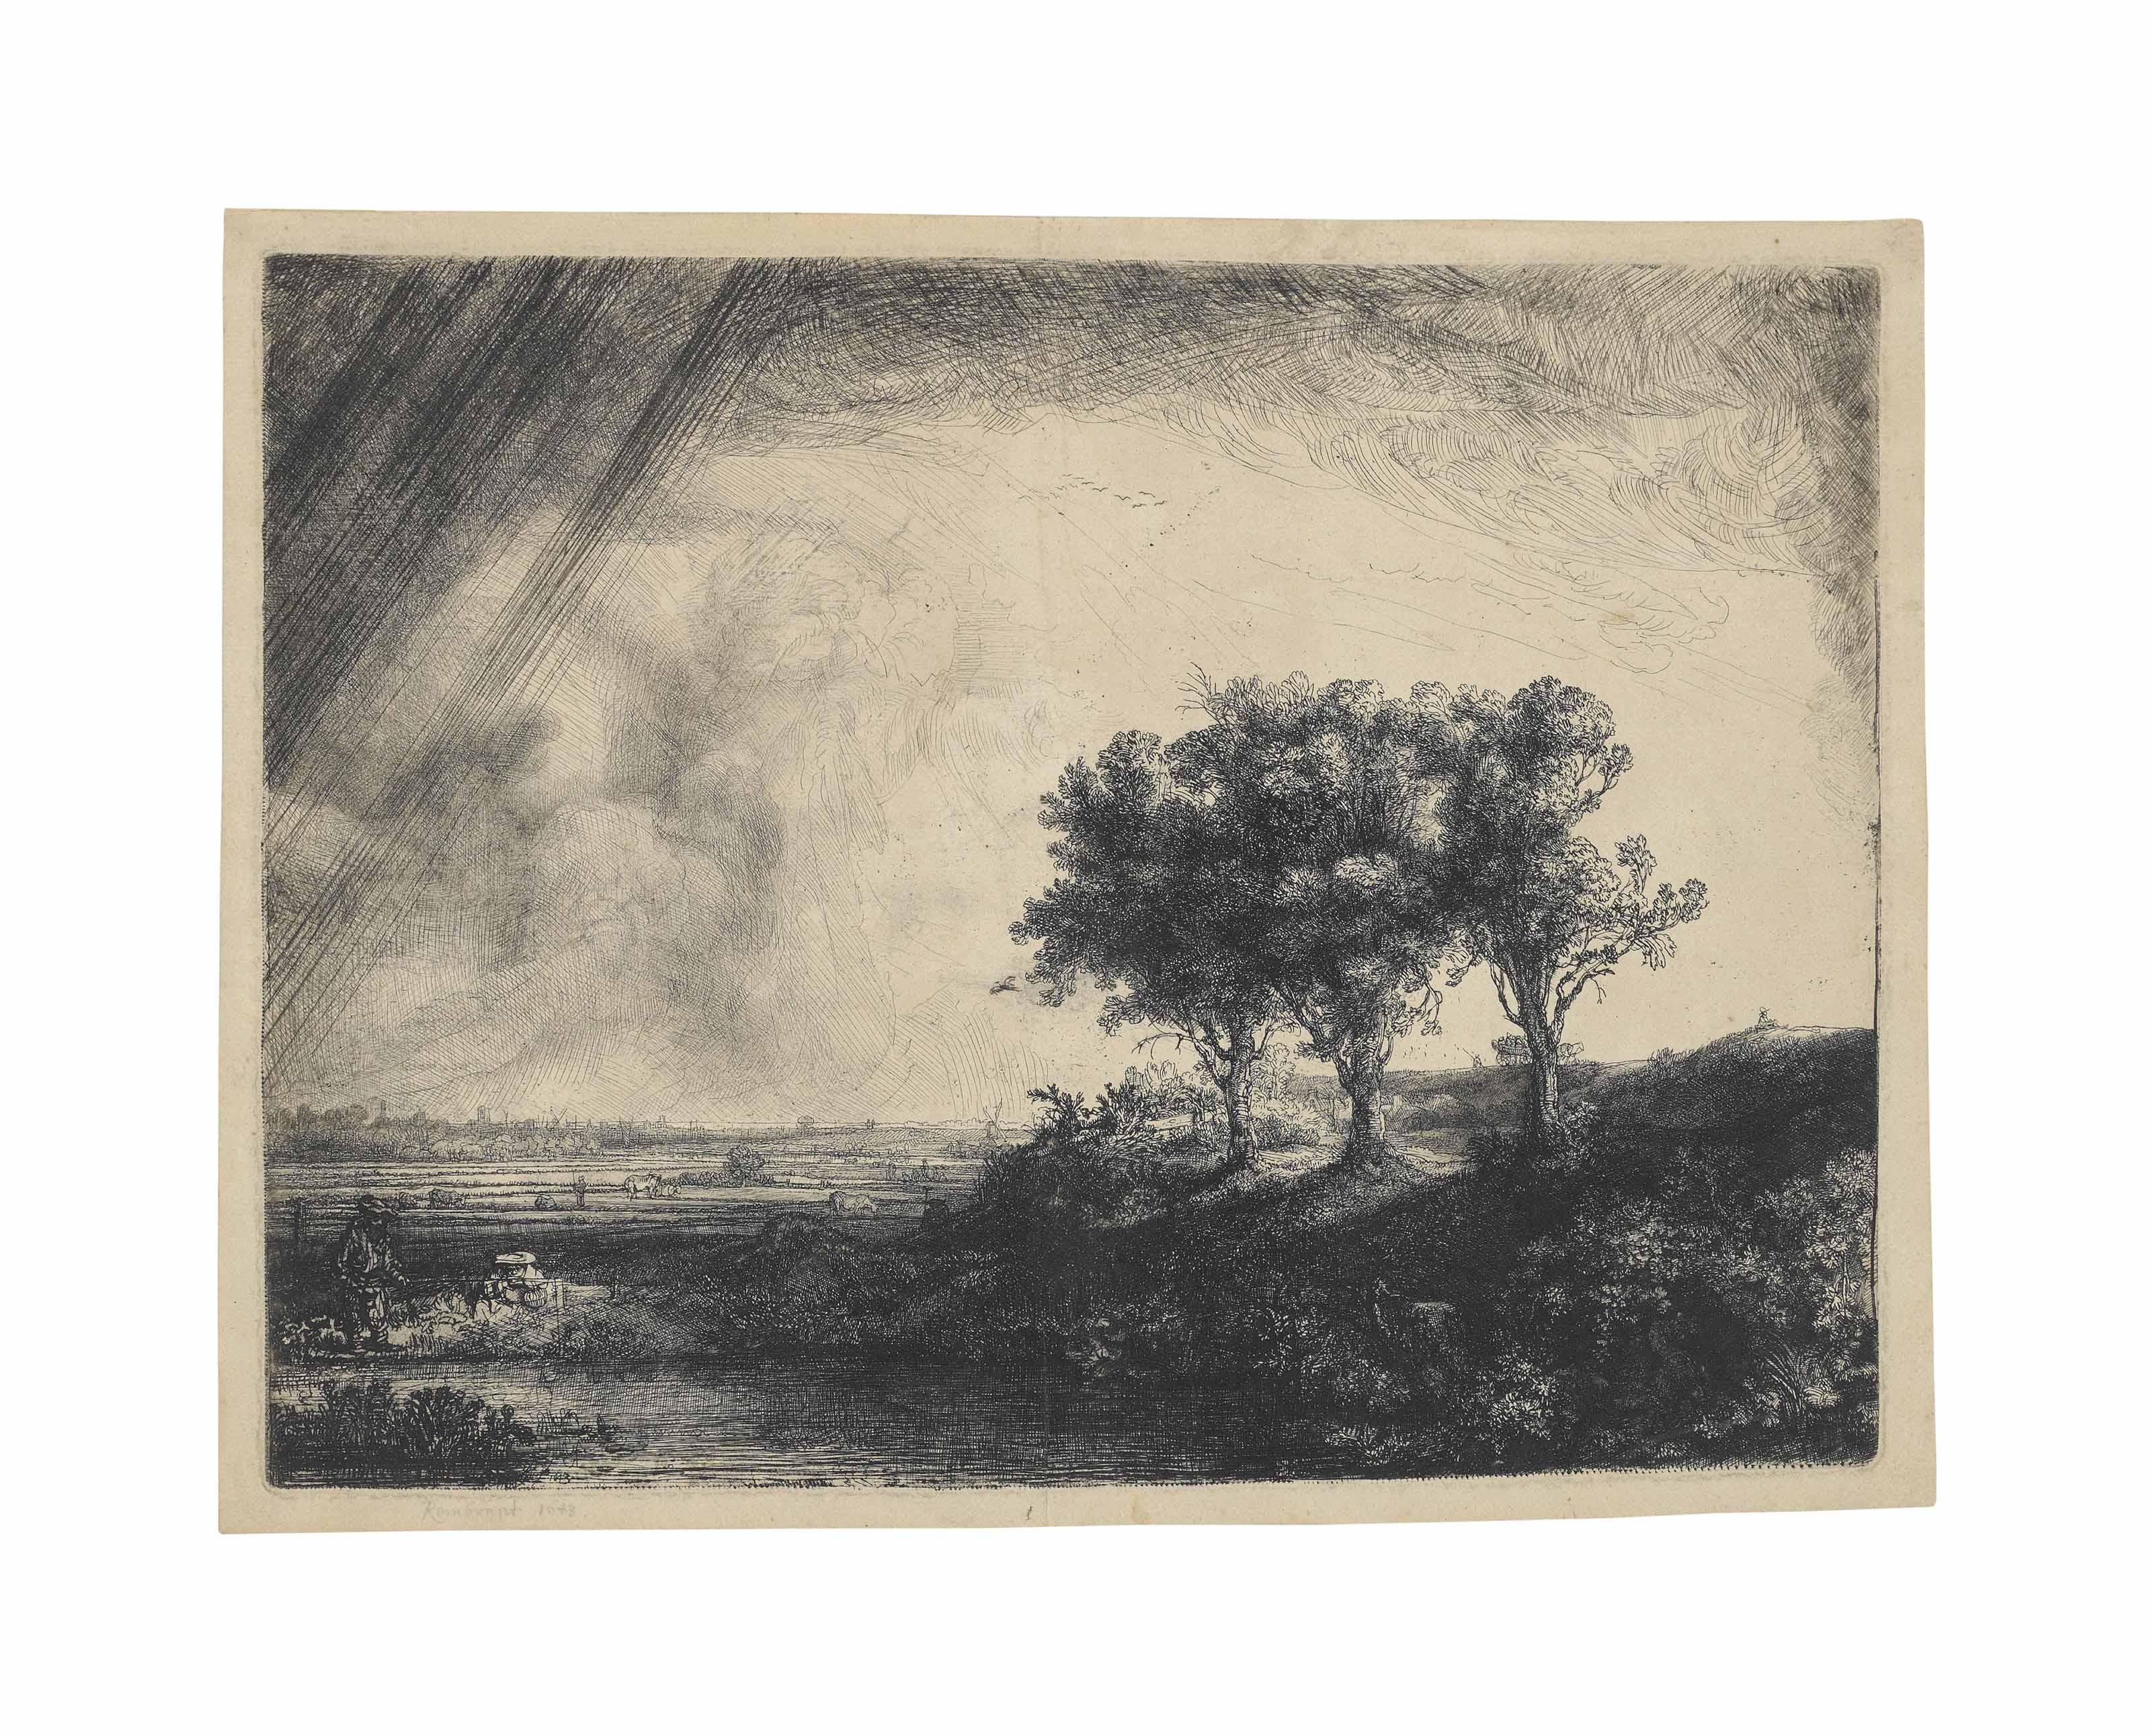 The Three Trees (B., Holl. 212; H. 205; New Holl. 214)